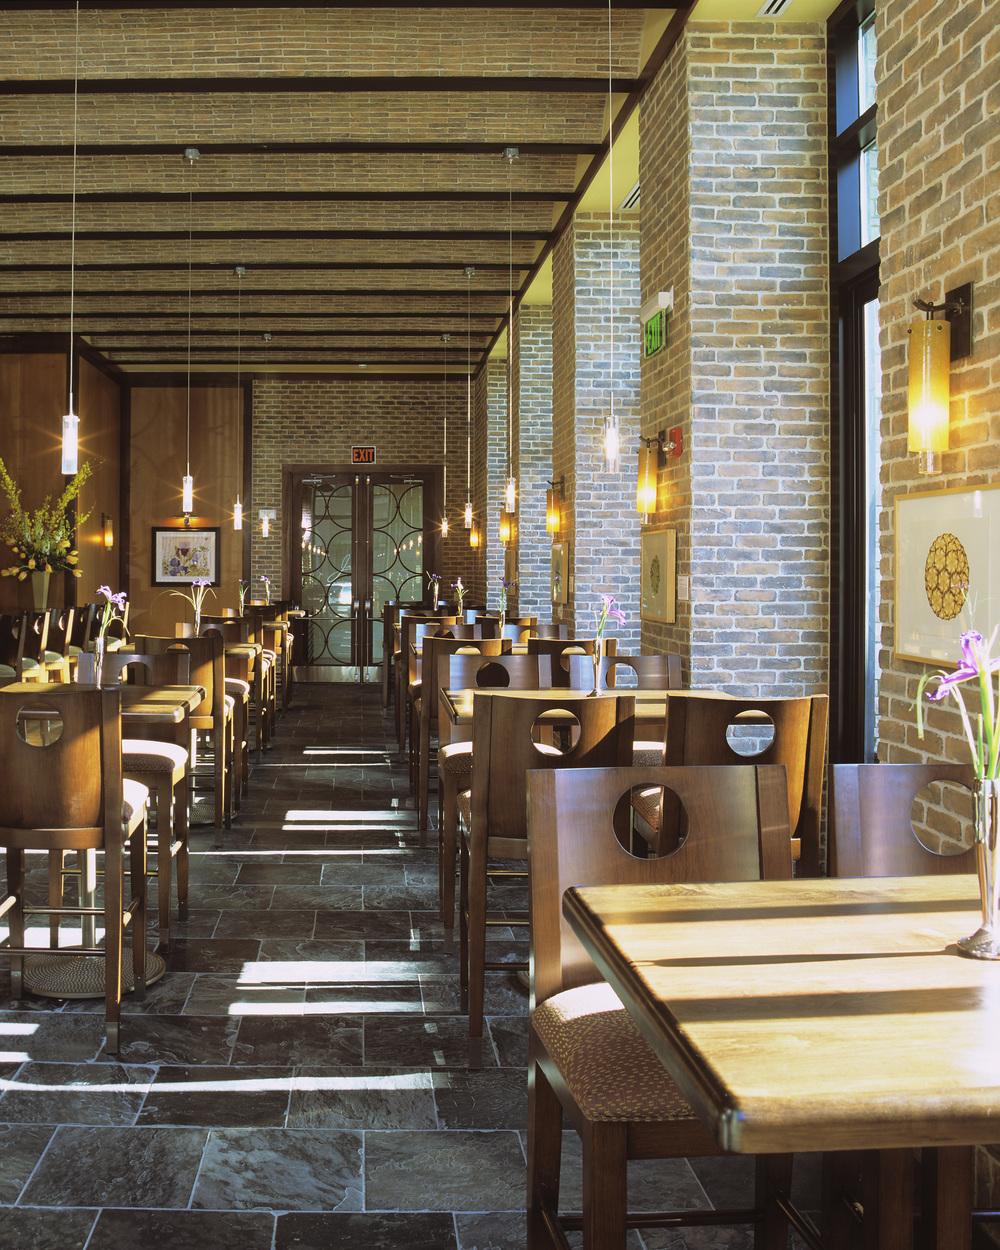 st_julien_hotel_boulder_colorado_restaurant.jpg